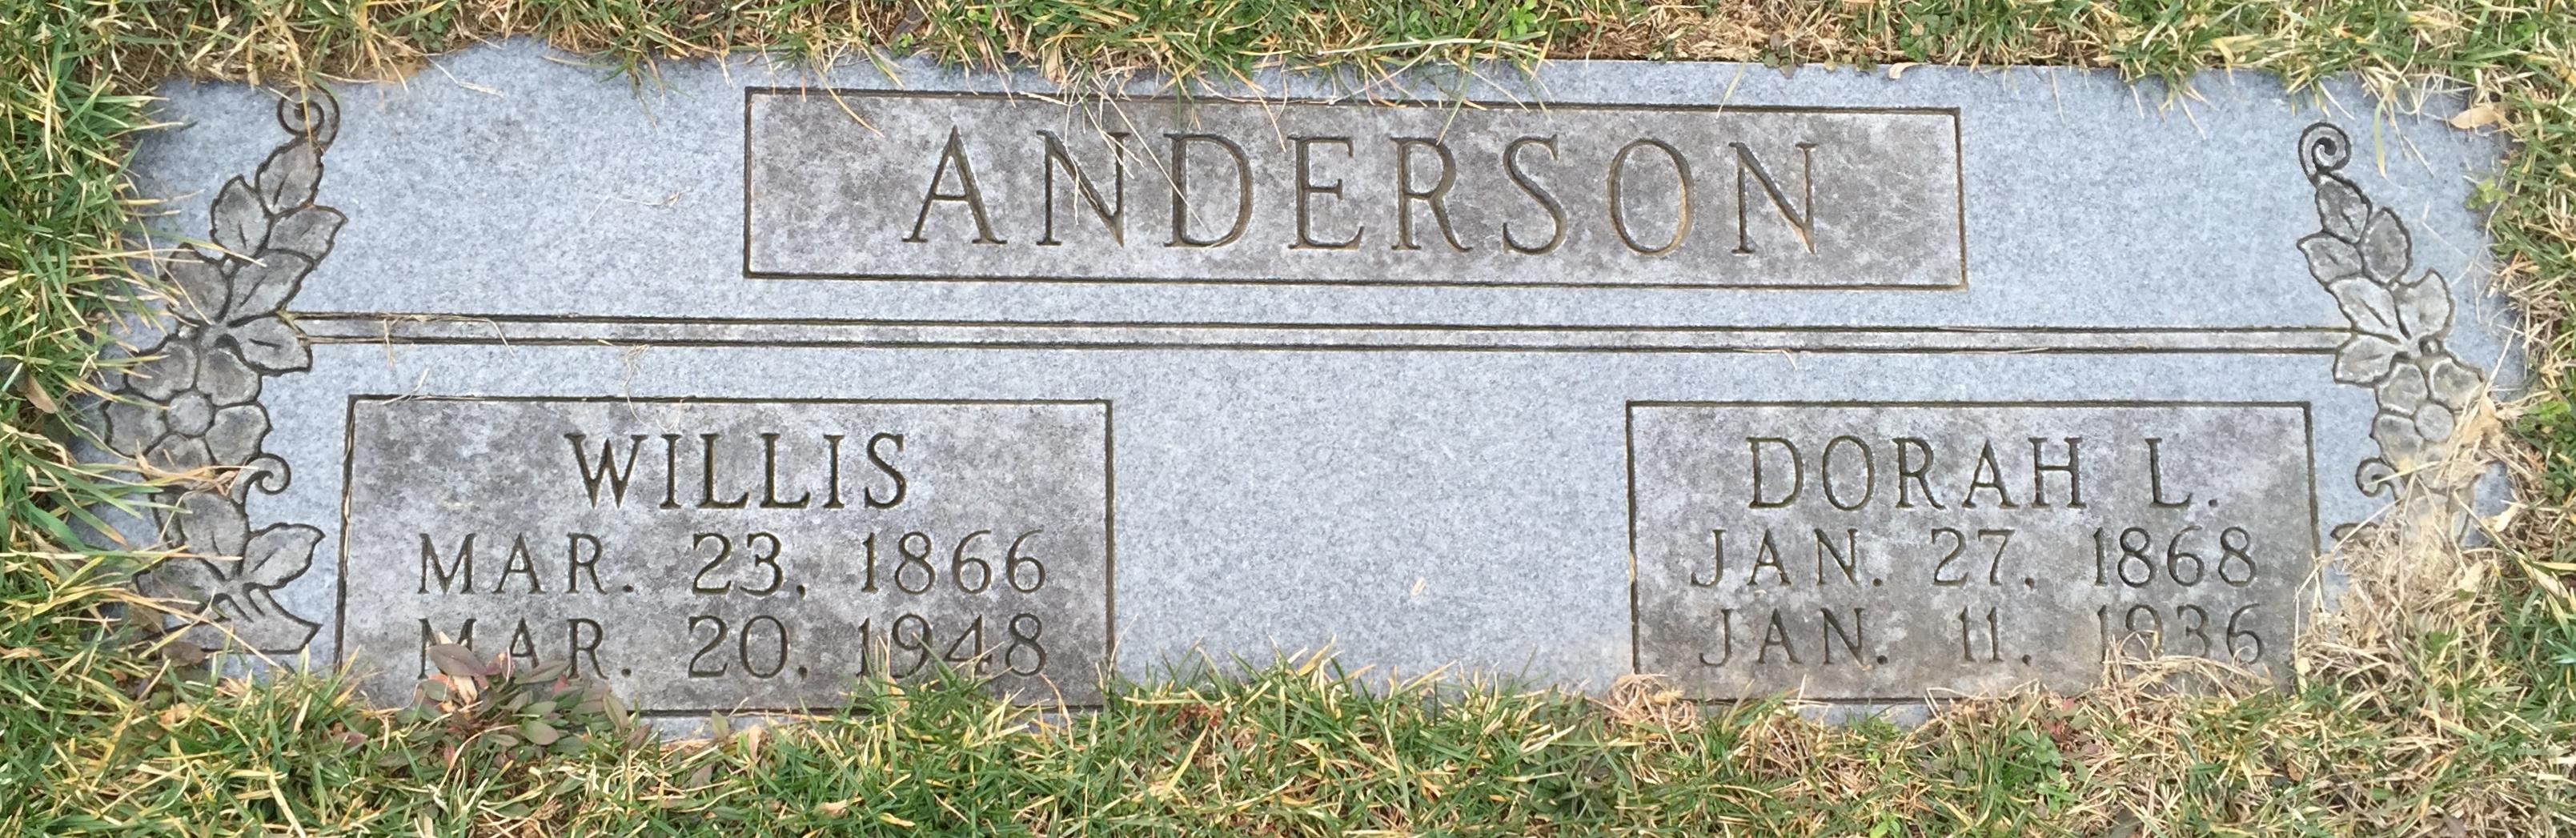 Dorah L. Anderson